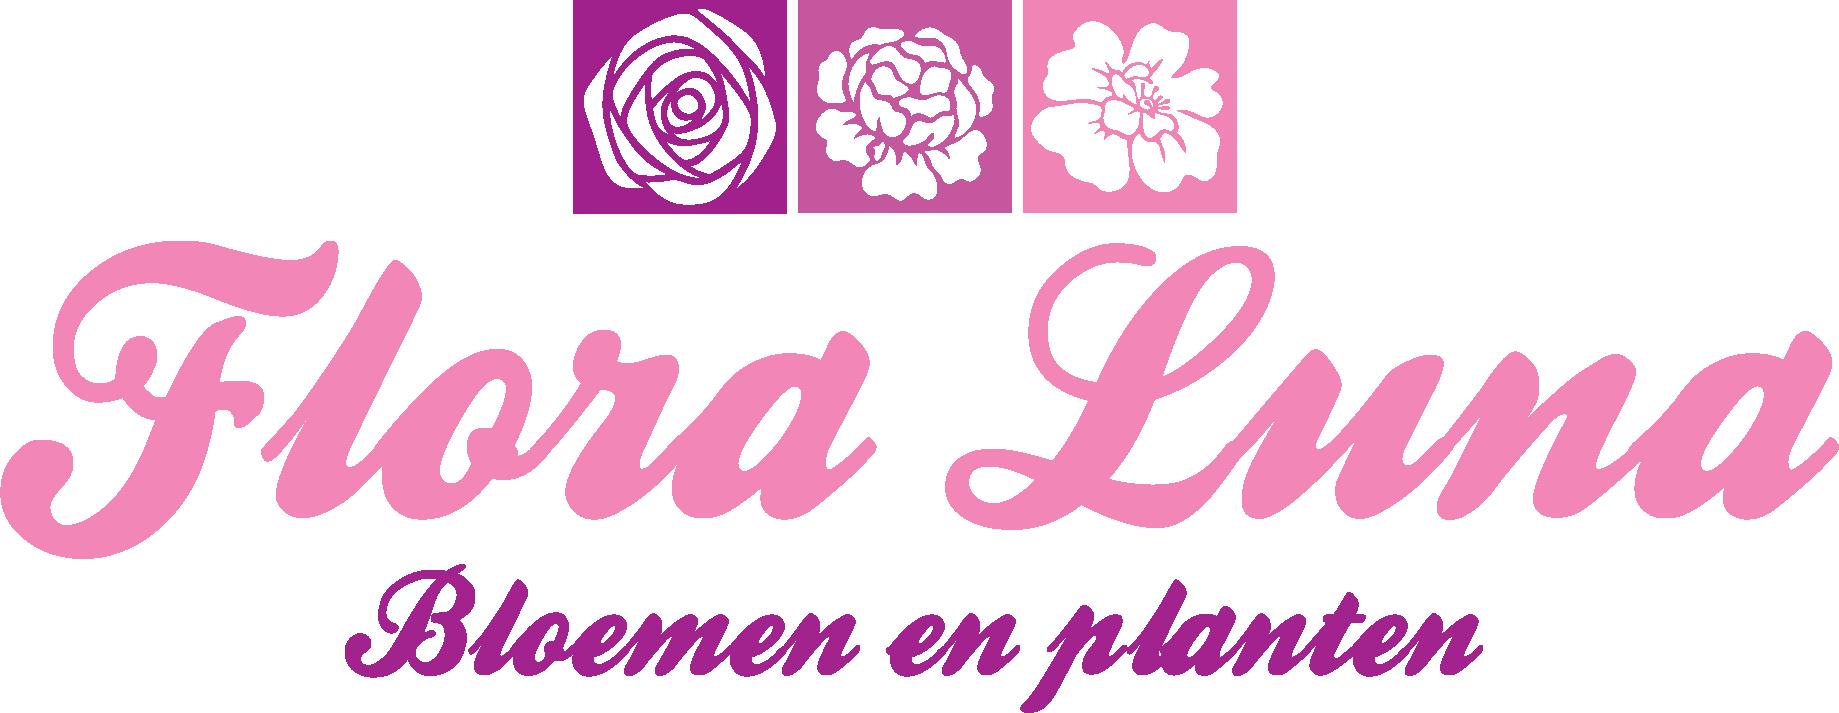 Flora Luna Bloemen | Planten | Bonheiden